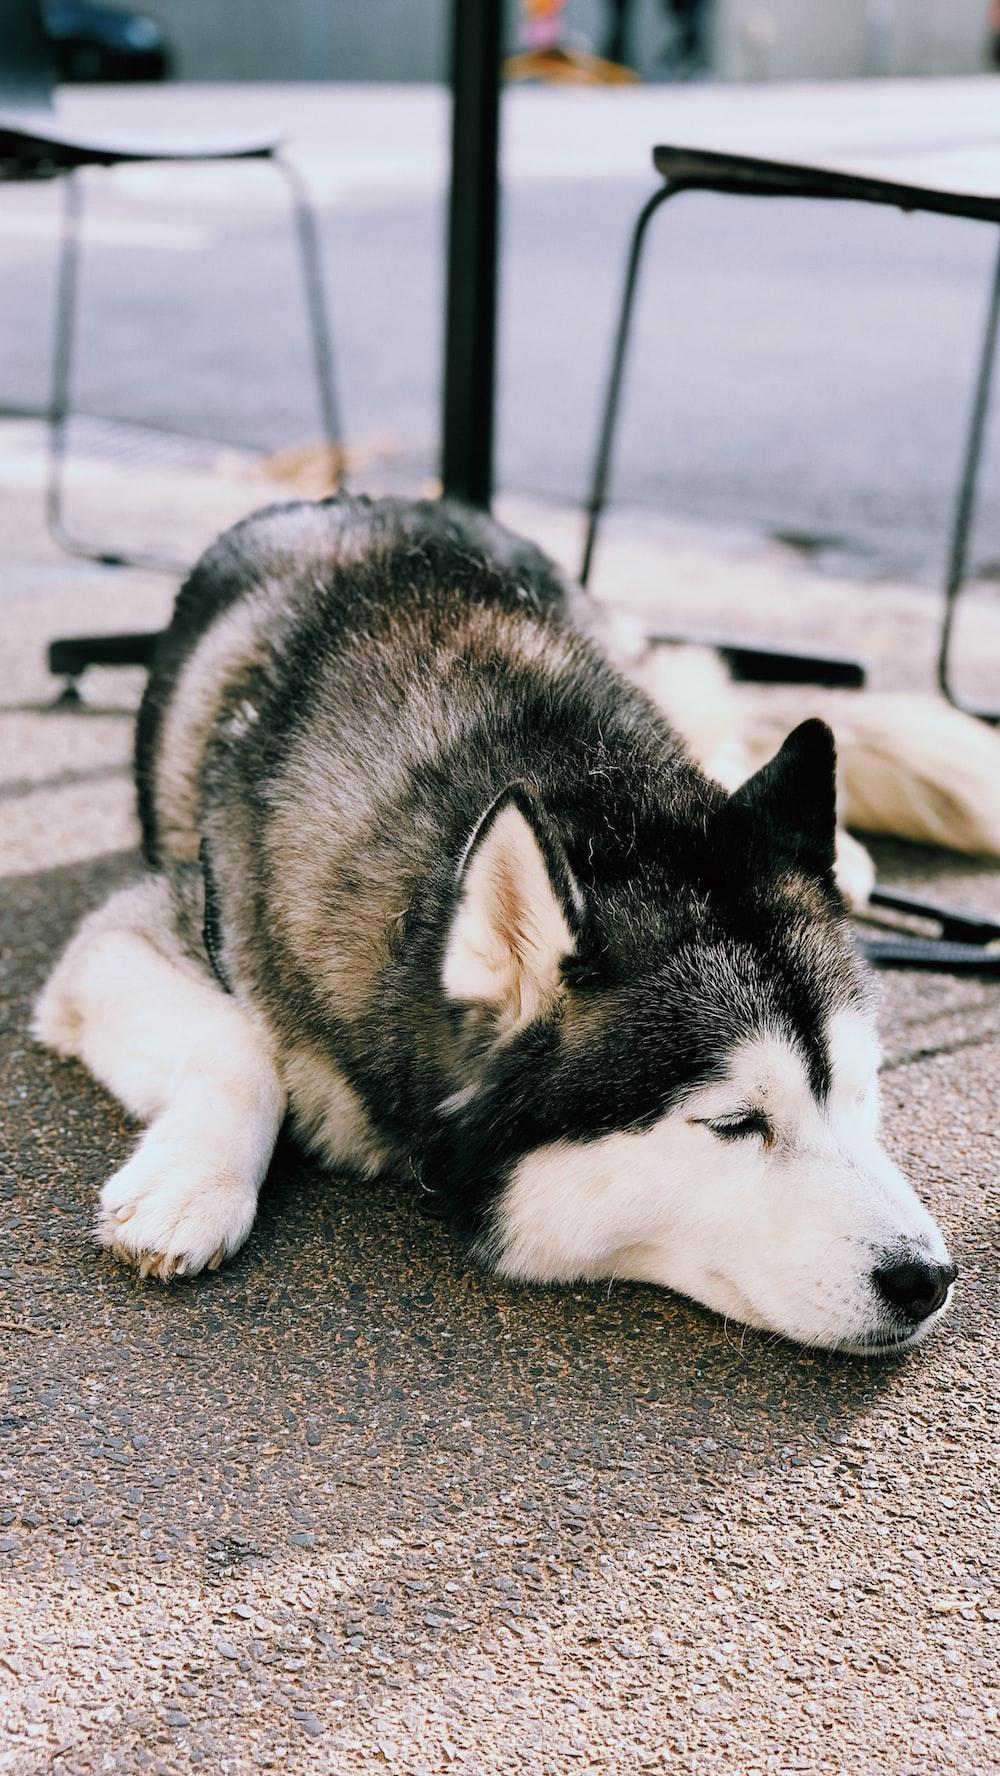 siberian husky puppy lying on the ground